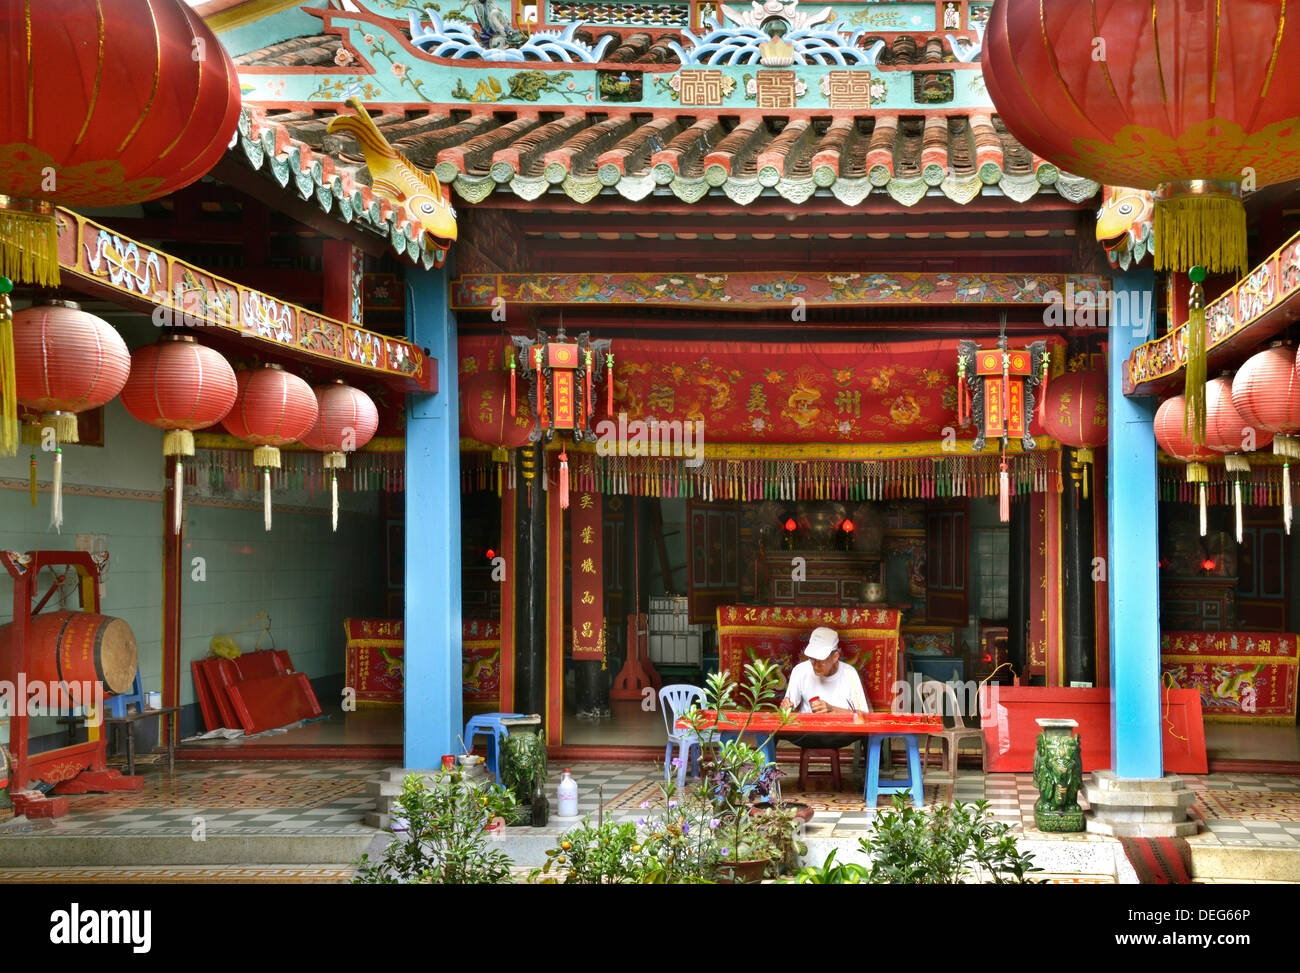 Chino clan house, Phan Thiet, Vietnam, Indochina, en el sudeste de Asia, Asia Foto de stock